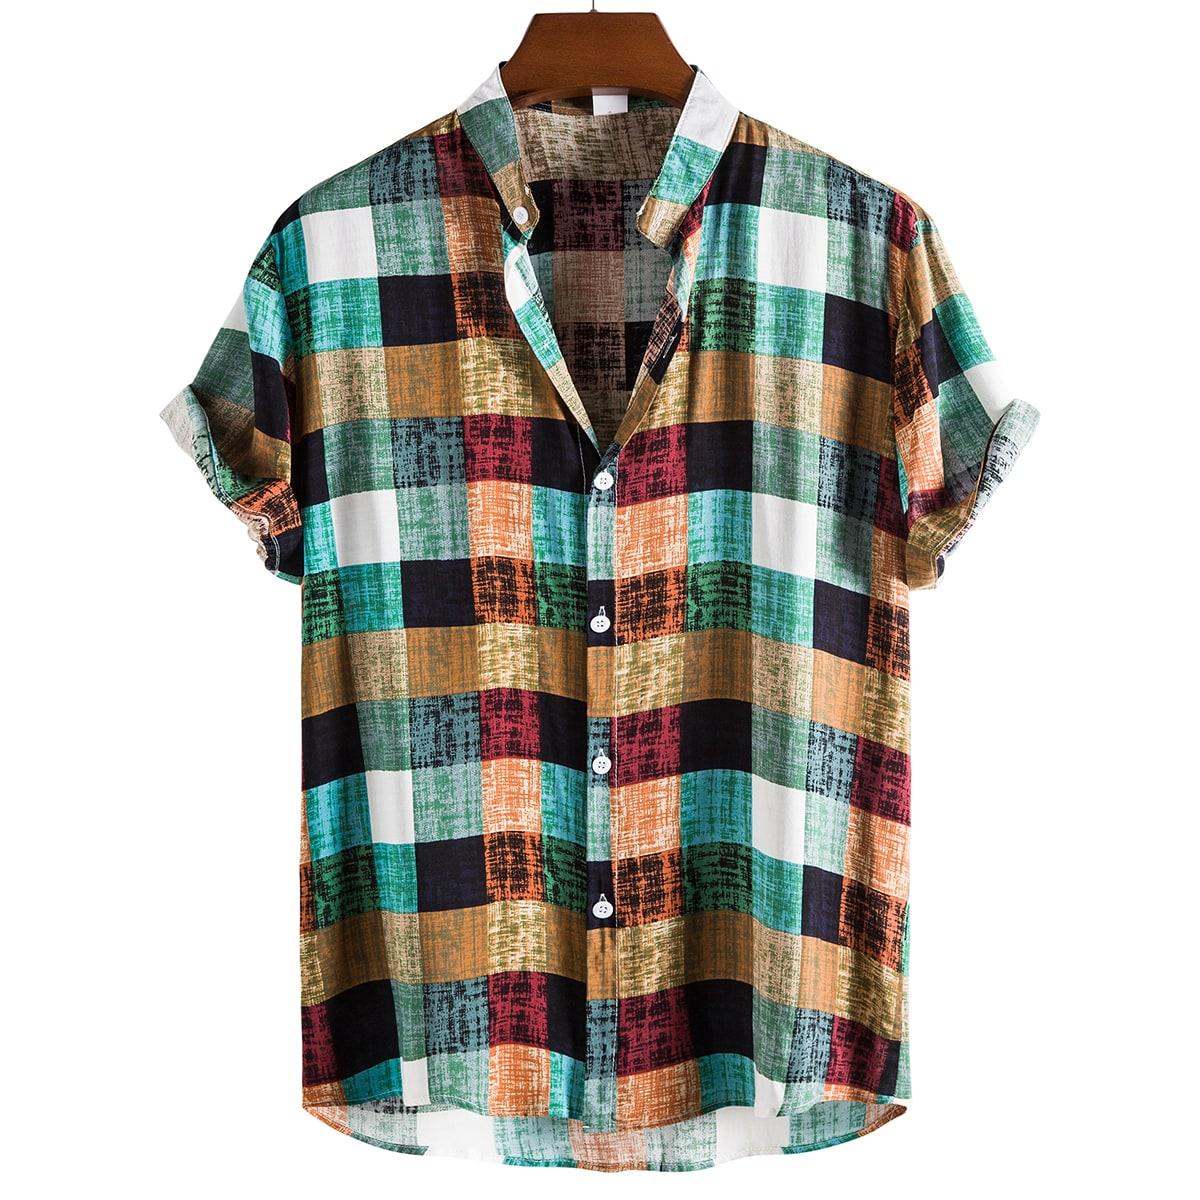 Пуговица Клетчатый Отпуск Мужские рубашки SheIn smshirt25210428650